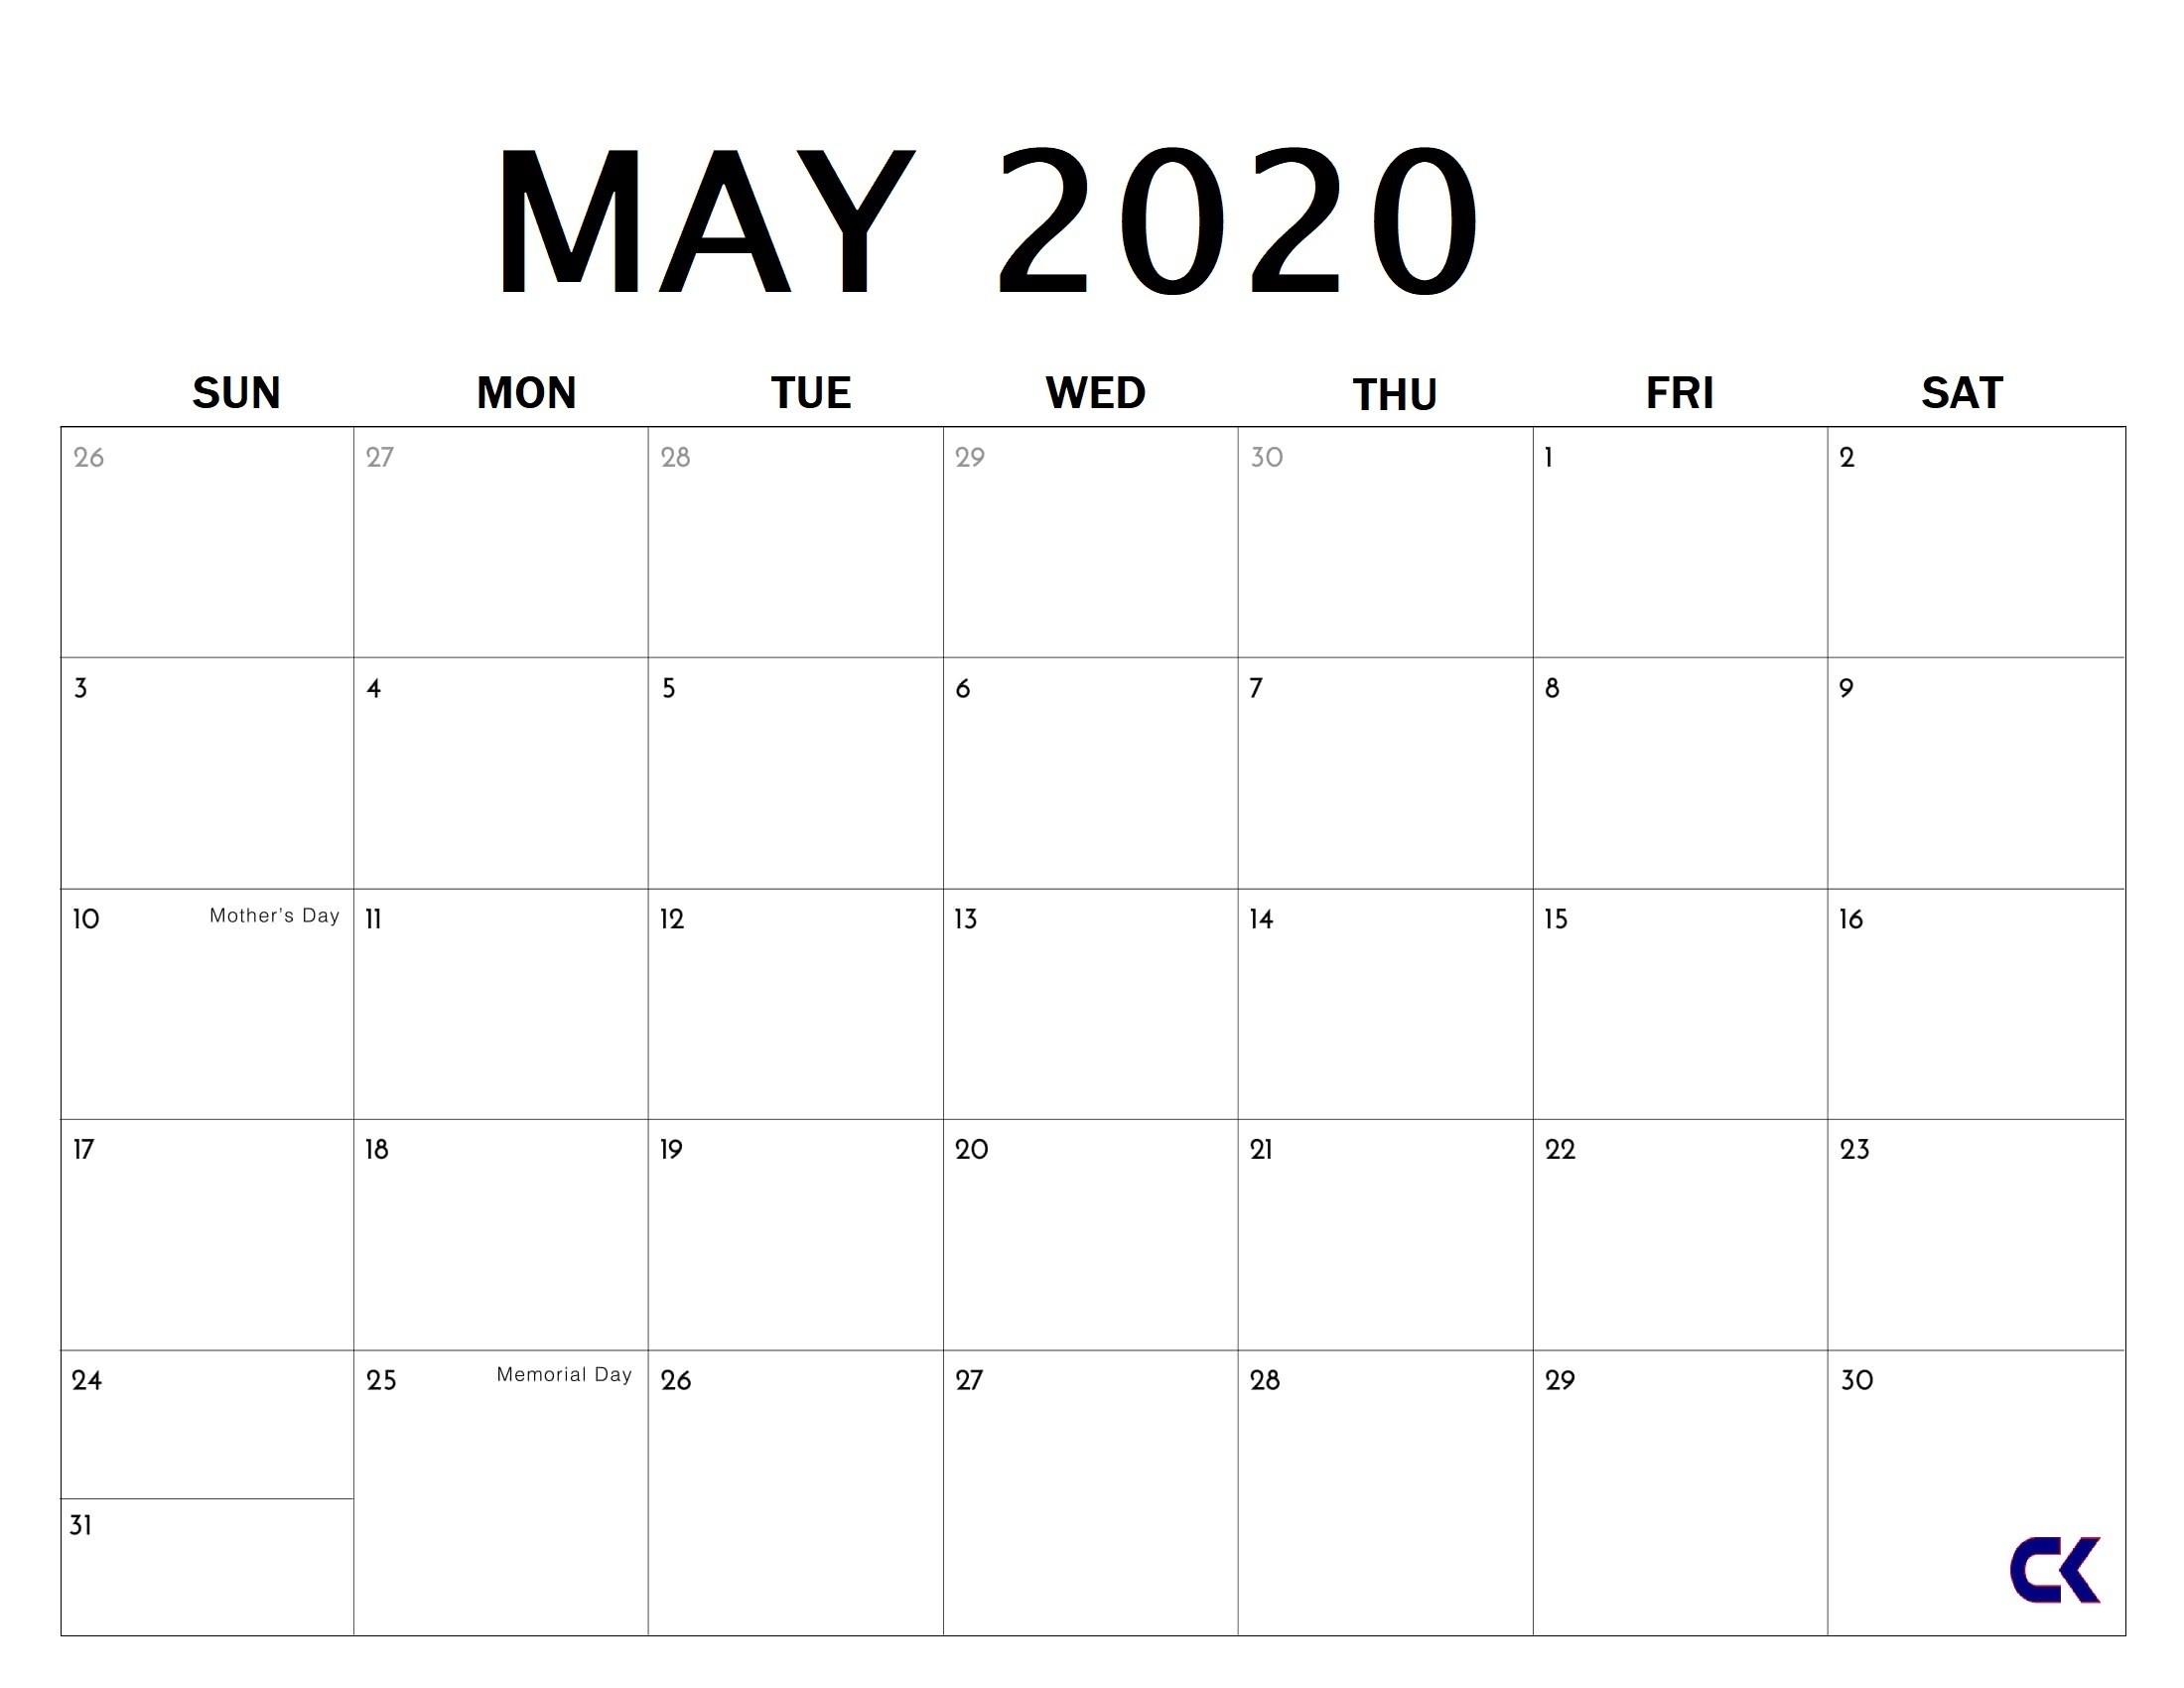 May 2020 Calendar Printable Free Download » Calendarkart  Free Printable Firefighter Editable Calendar